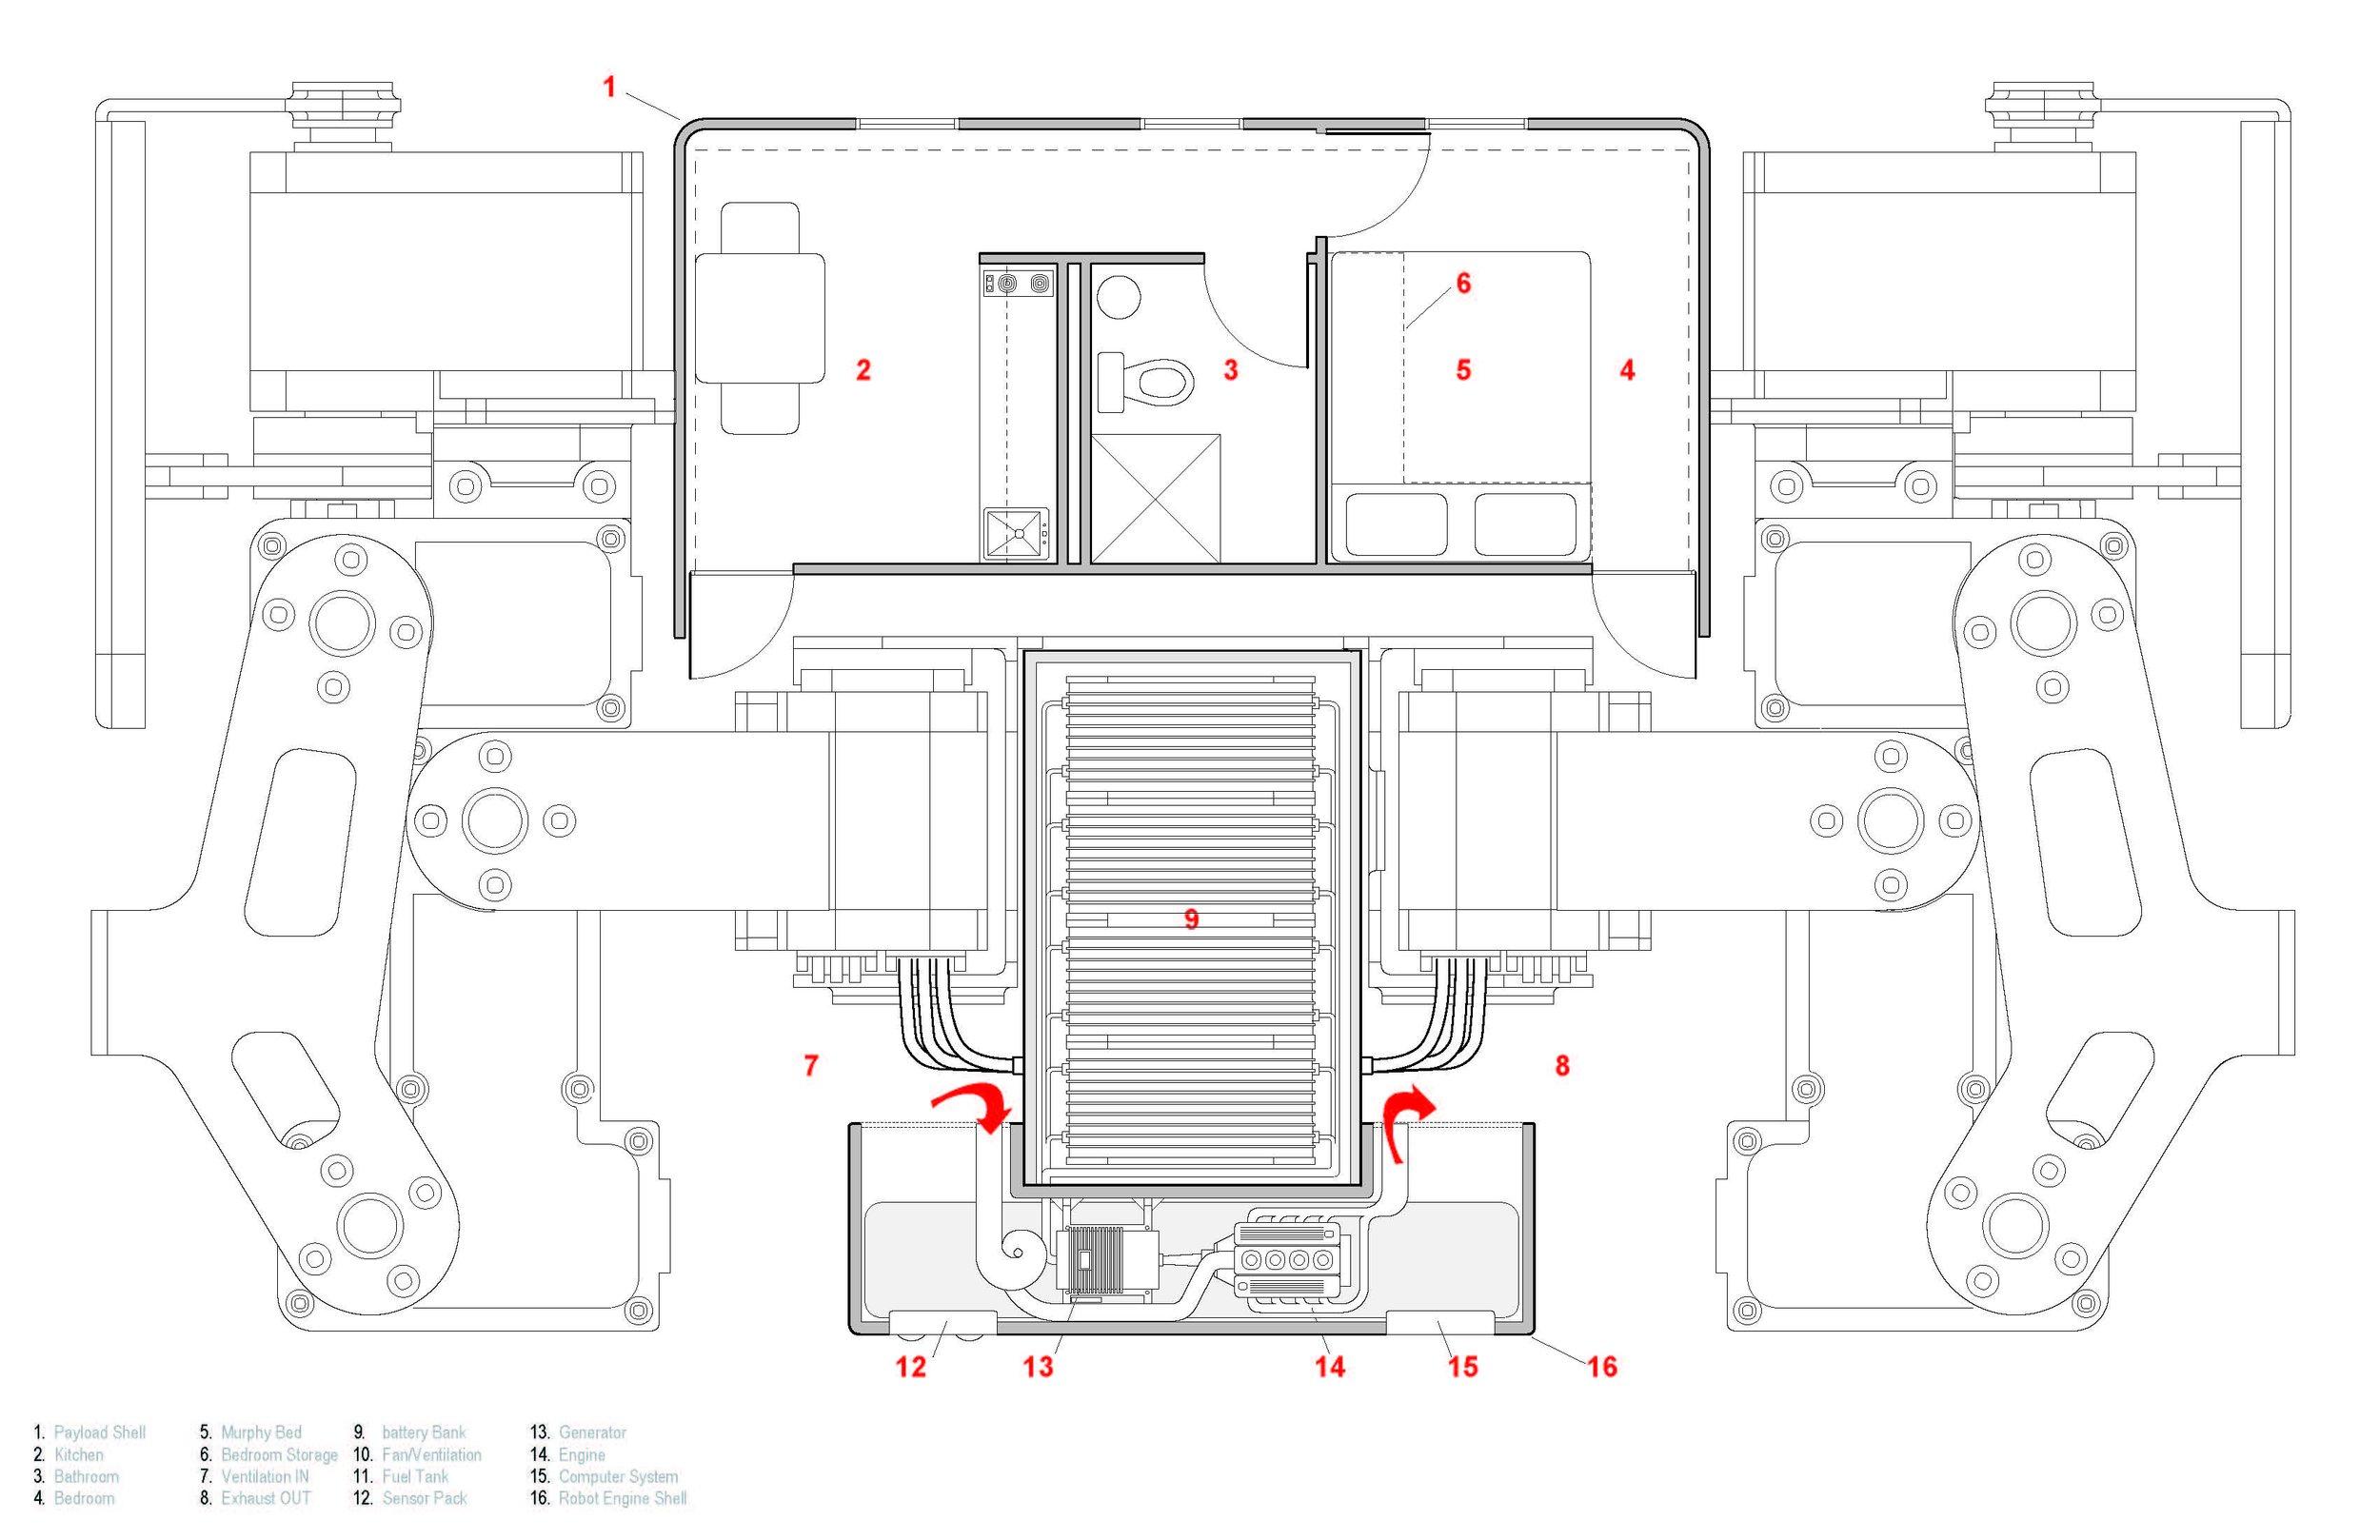 Robot Systems Plan.jpg